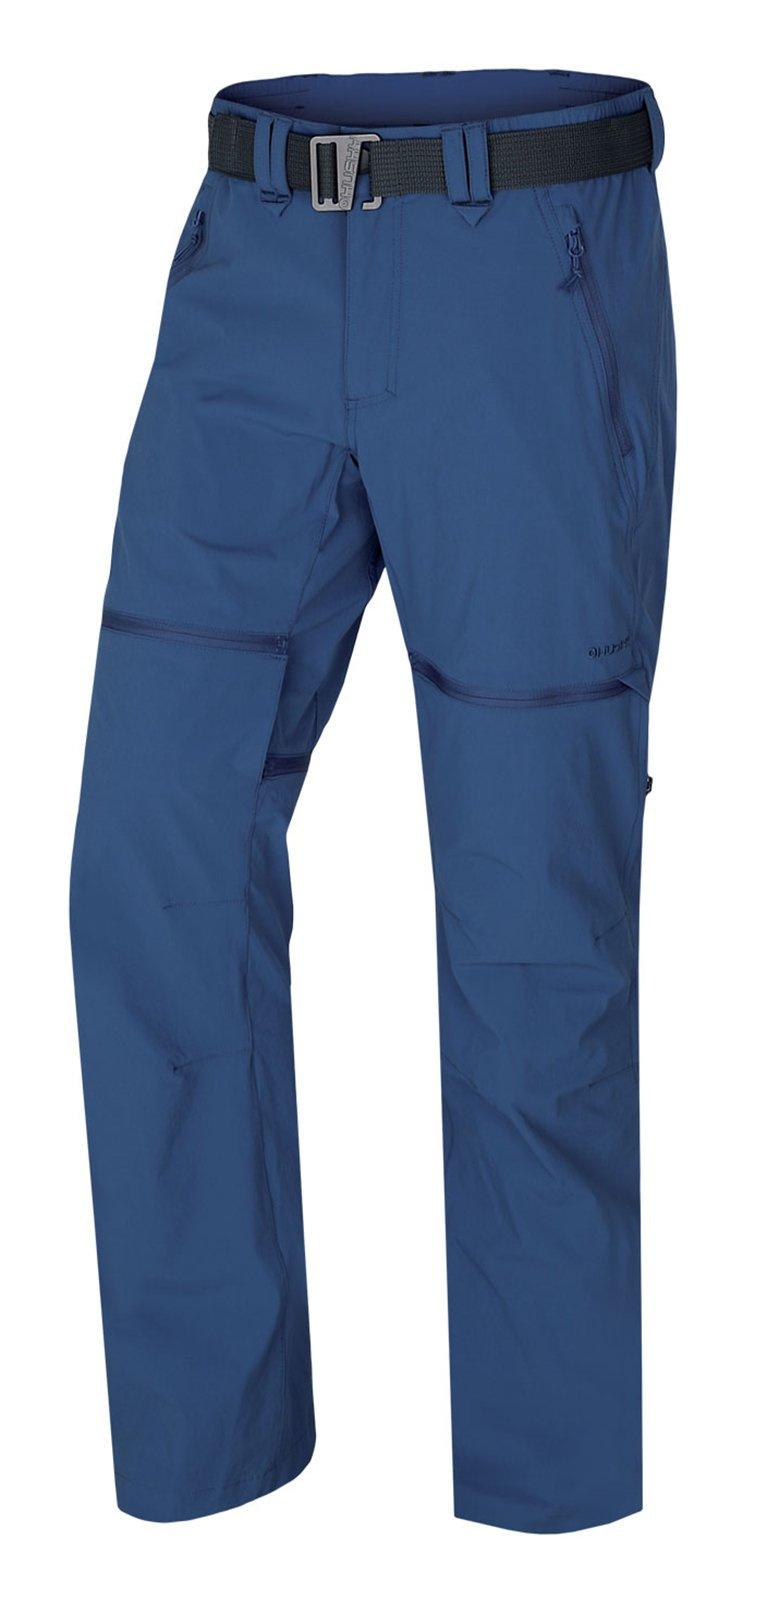 Husky Pilon M tm. modrá, M Pánske outdoor nohavice